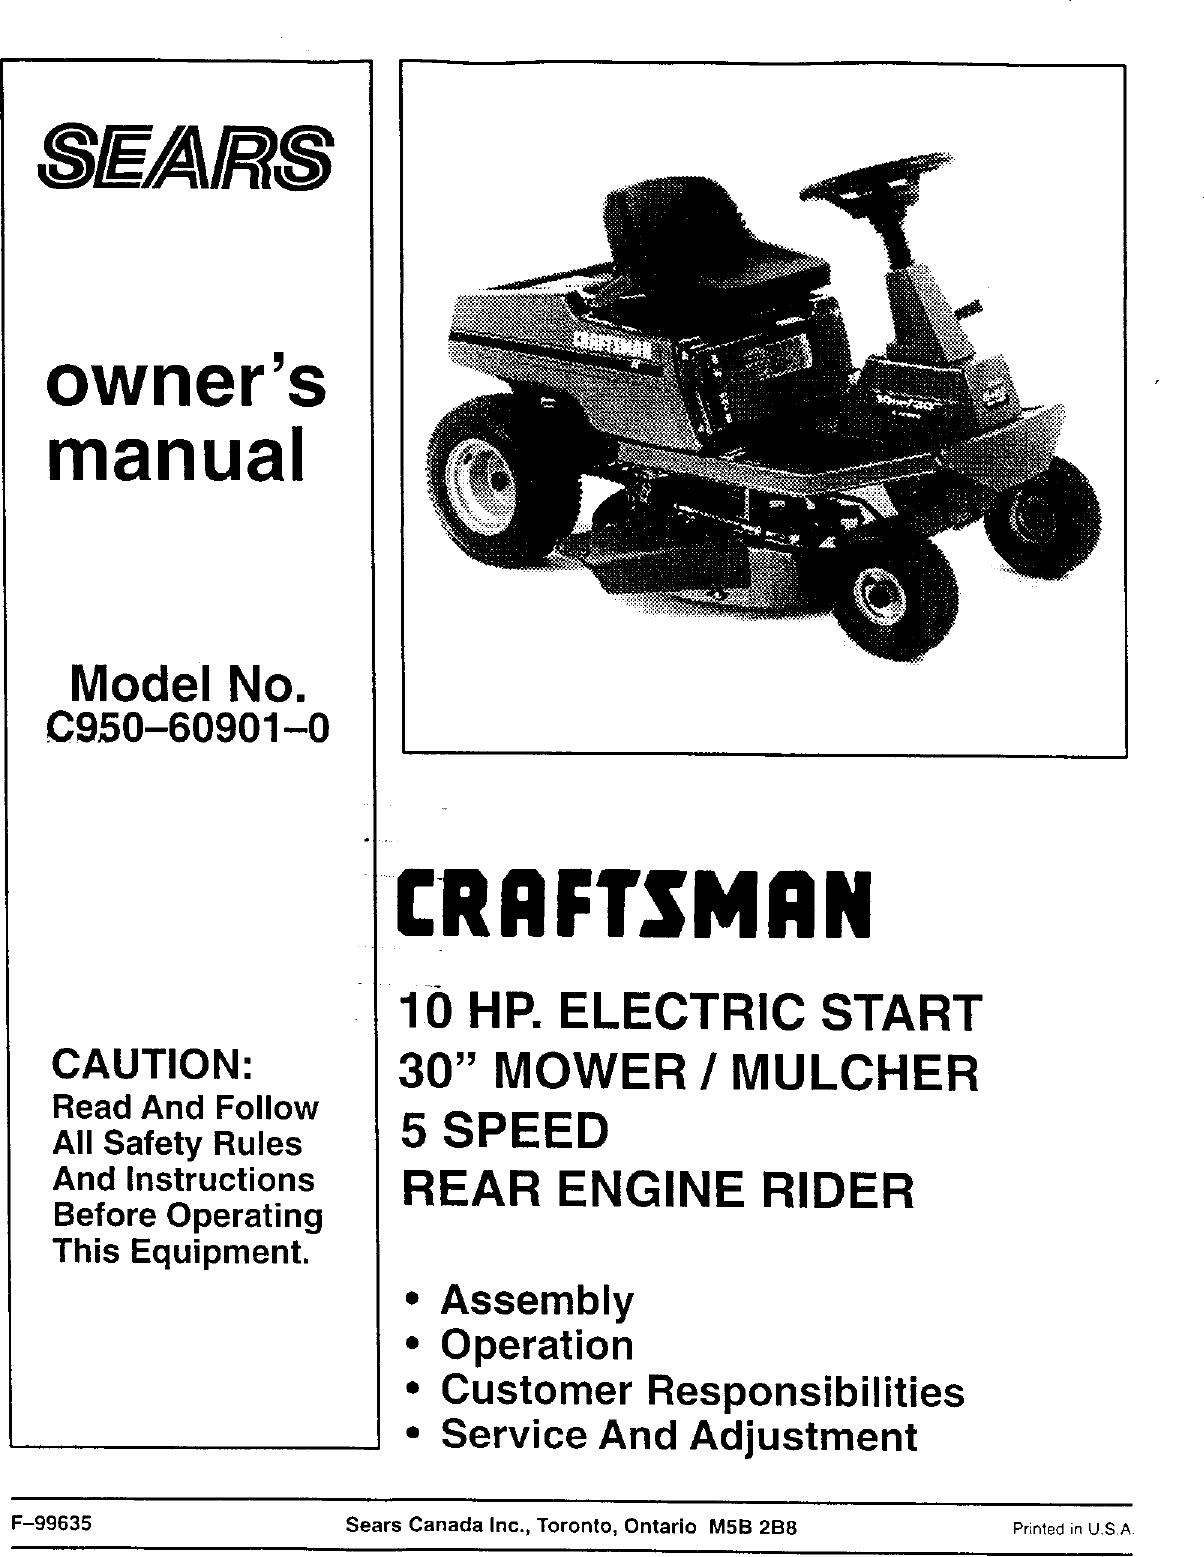 Sears Canada Manual For 712-30142-0